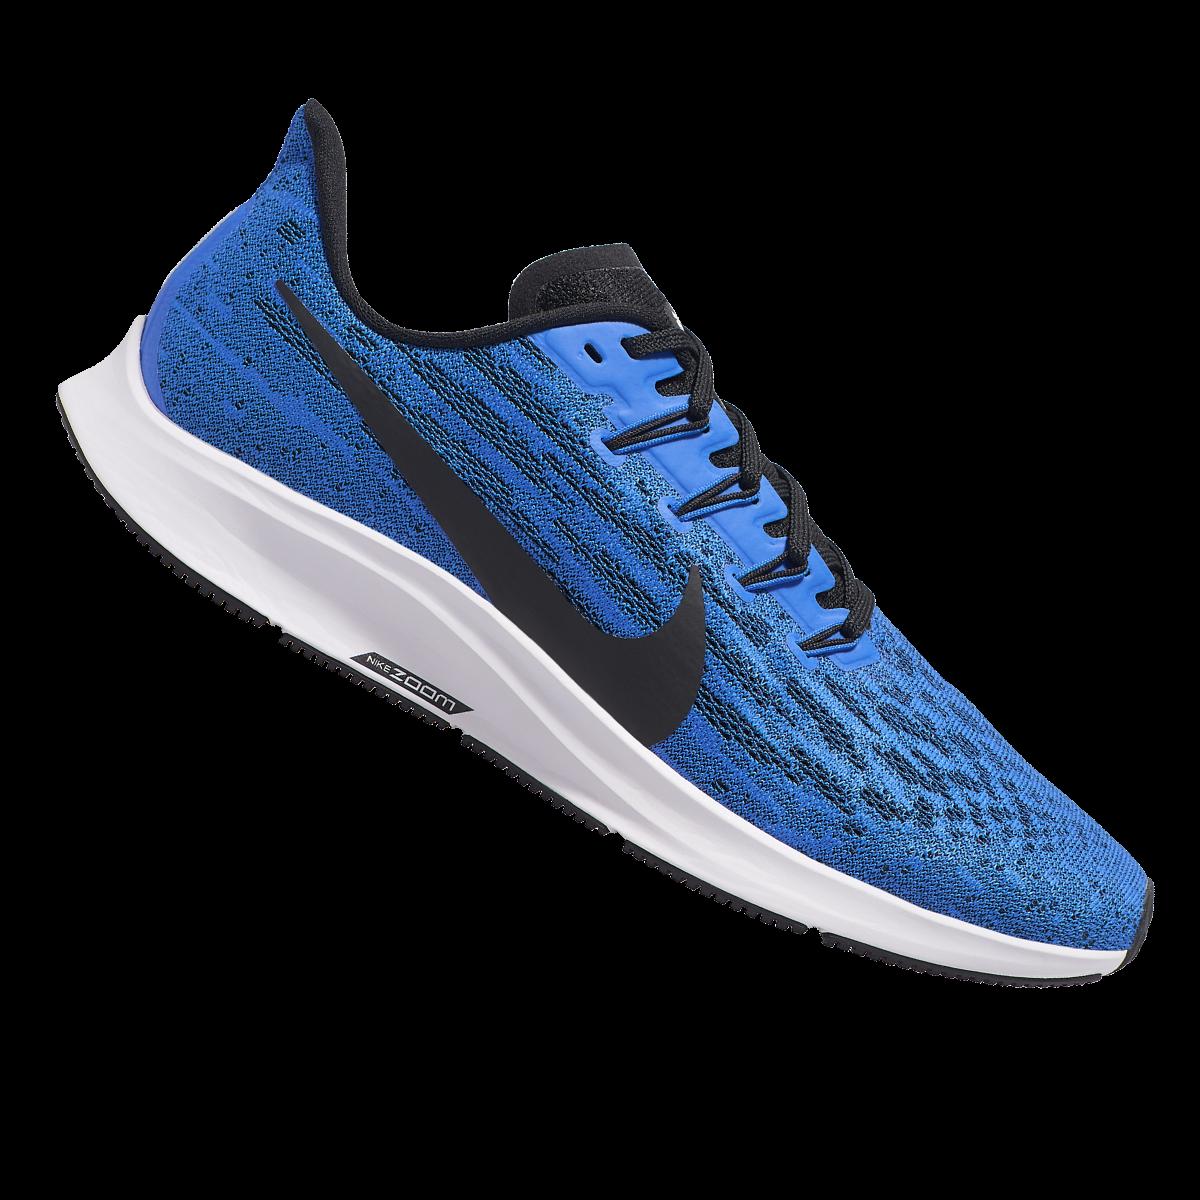 Nike hardloopschoenen Air Zoom Pegasus 36 blauwzwart